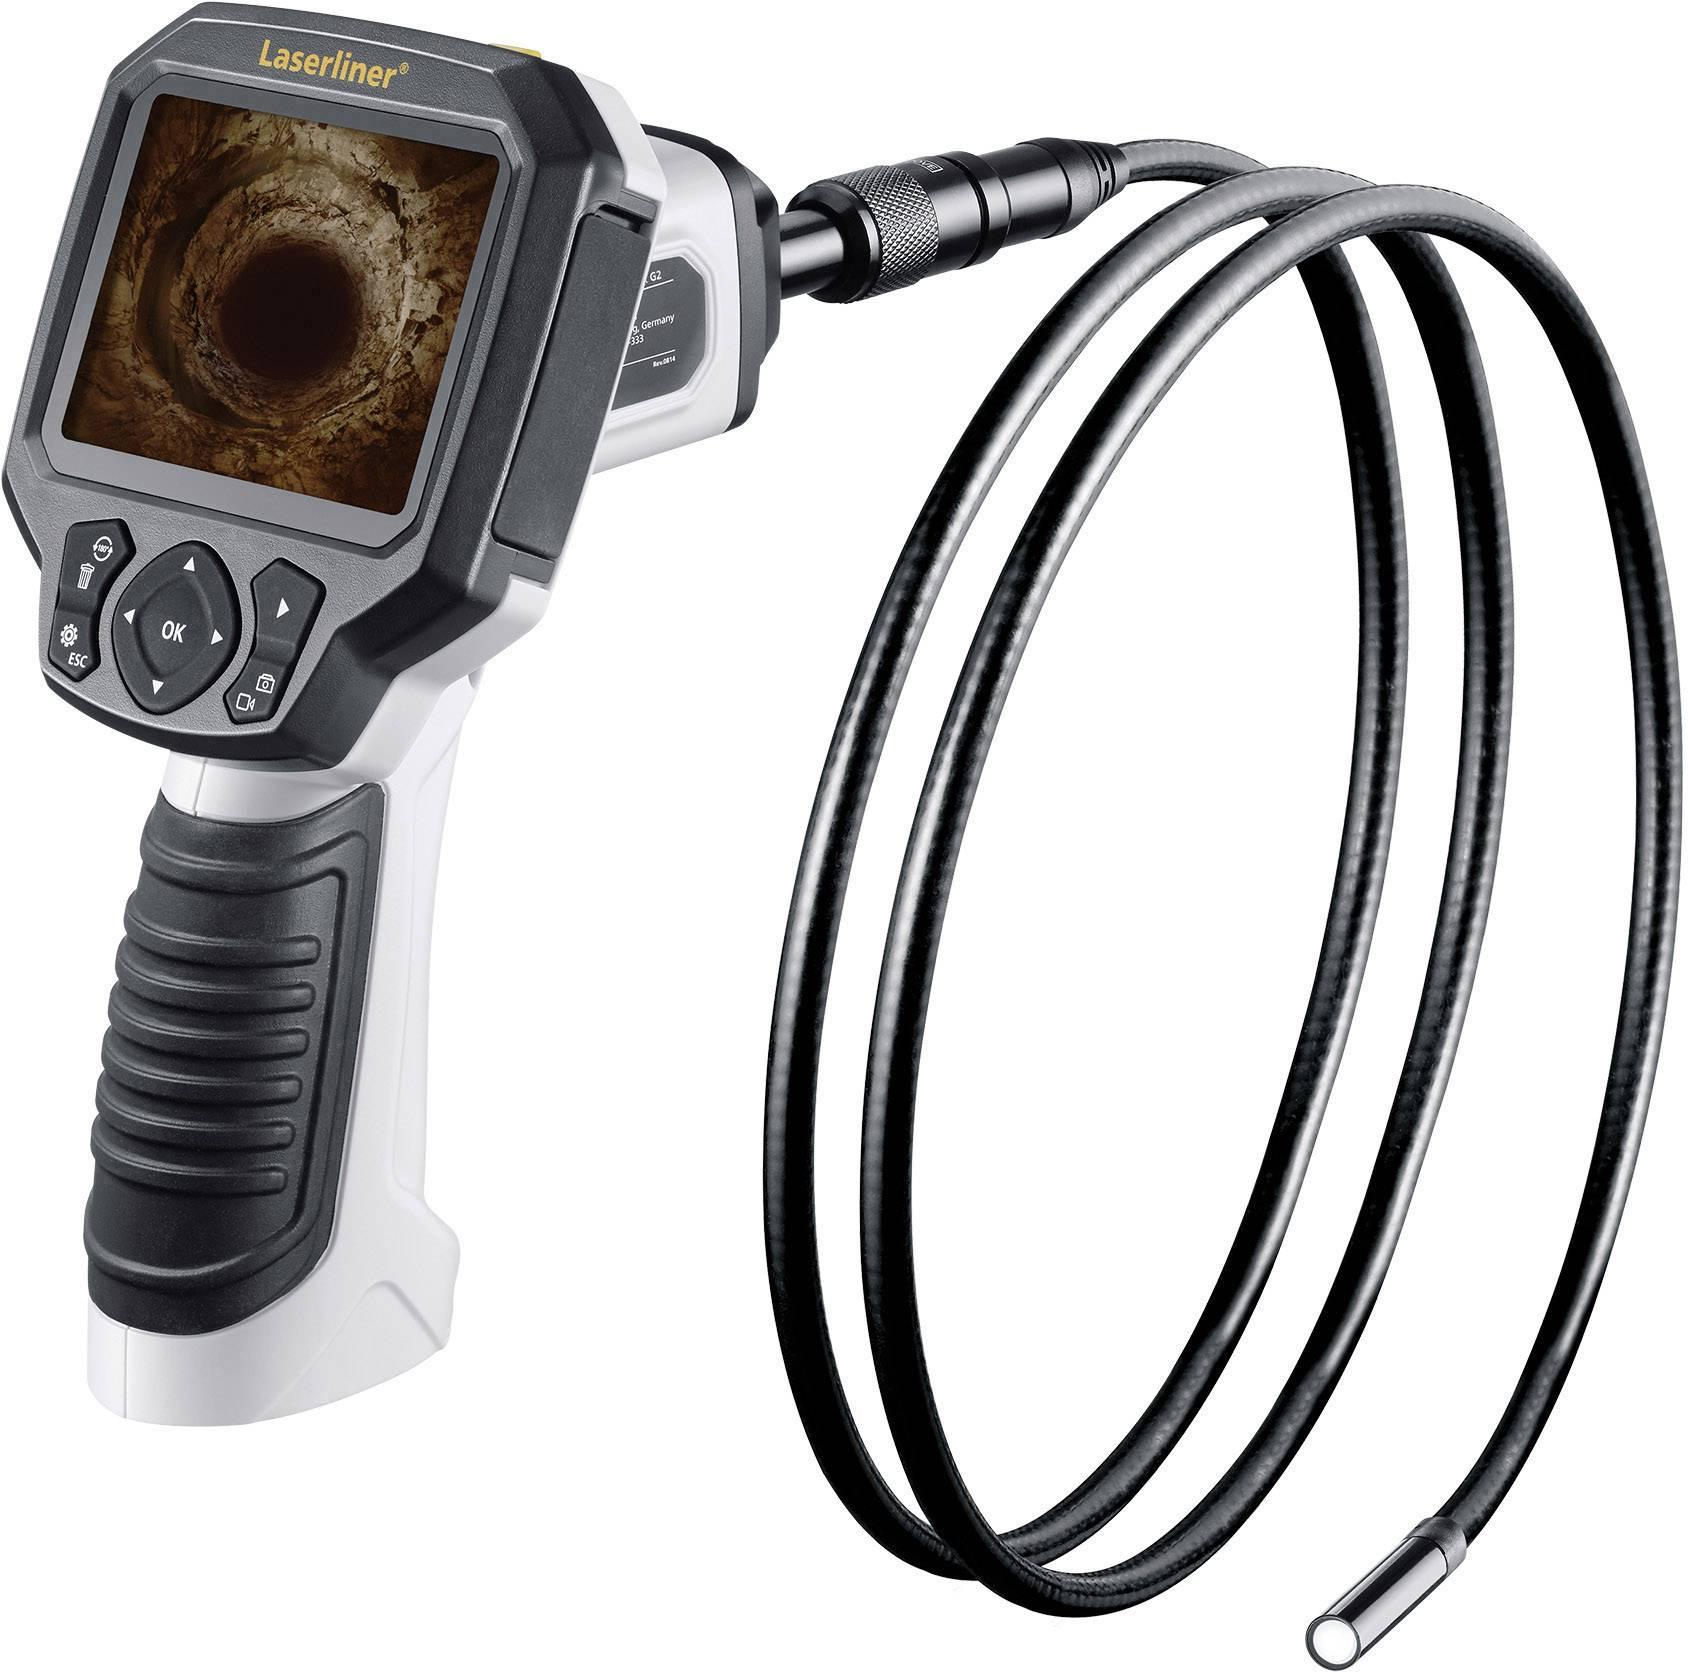 Inspekčná kamera endoskopu Laserliner VideoFlex G3 082.212A, Ø sondy: 9 mm, dĺžka sondy: 1.5 m